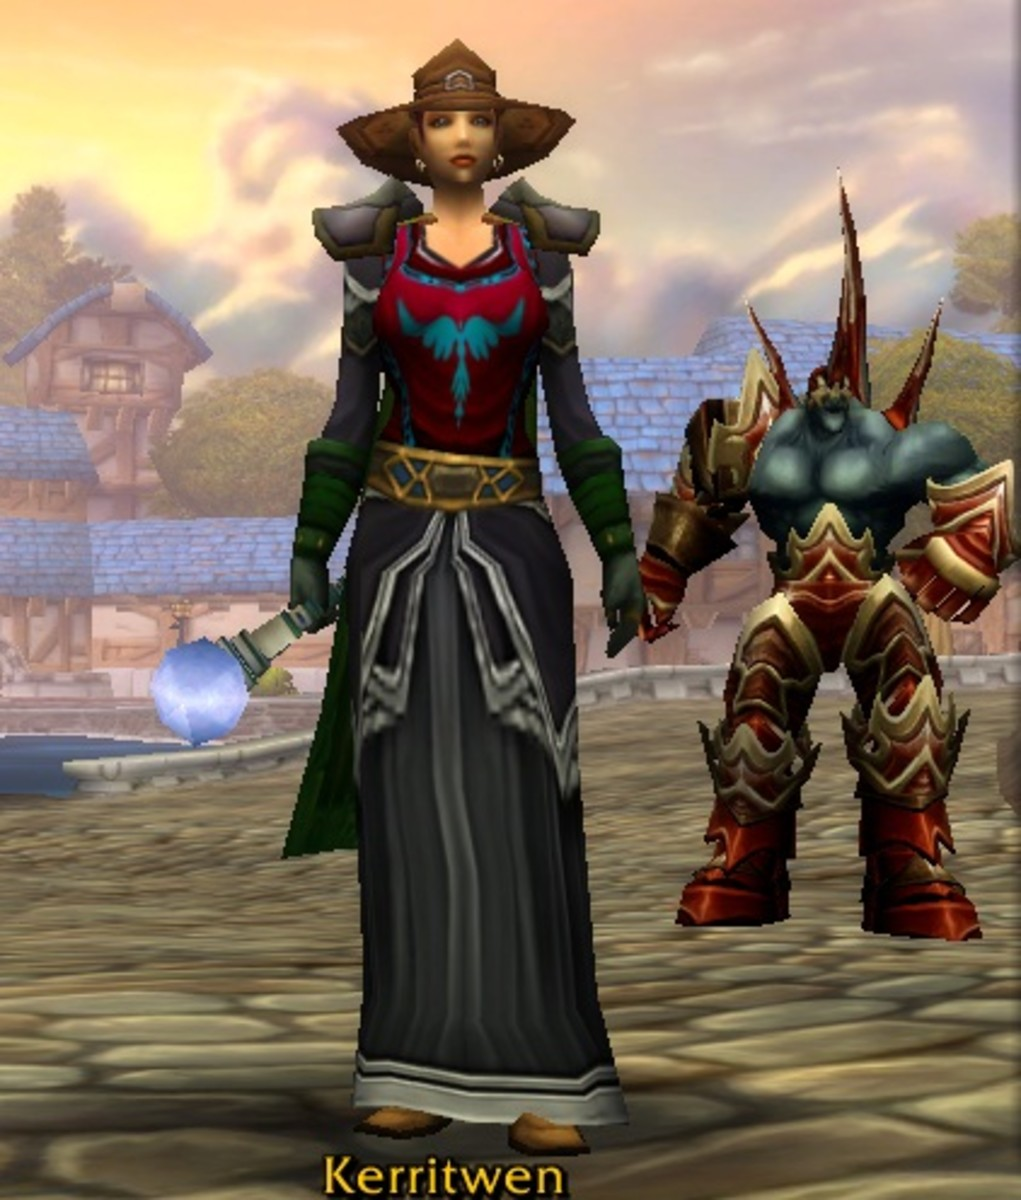 Human Warlock: one of my Alliance alts. Kerritwen is one variant spelling of Ceridwen.